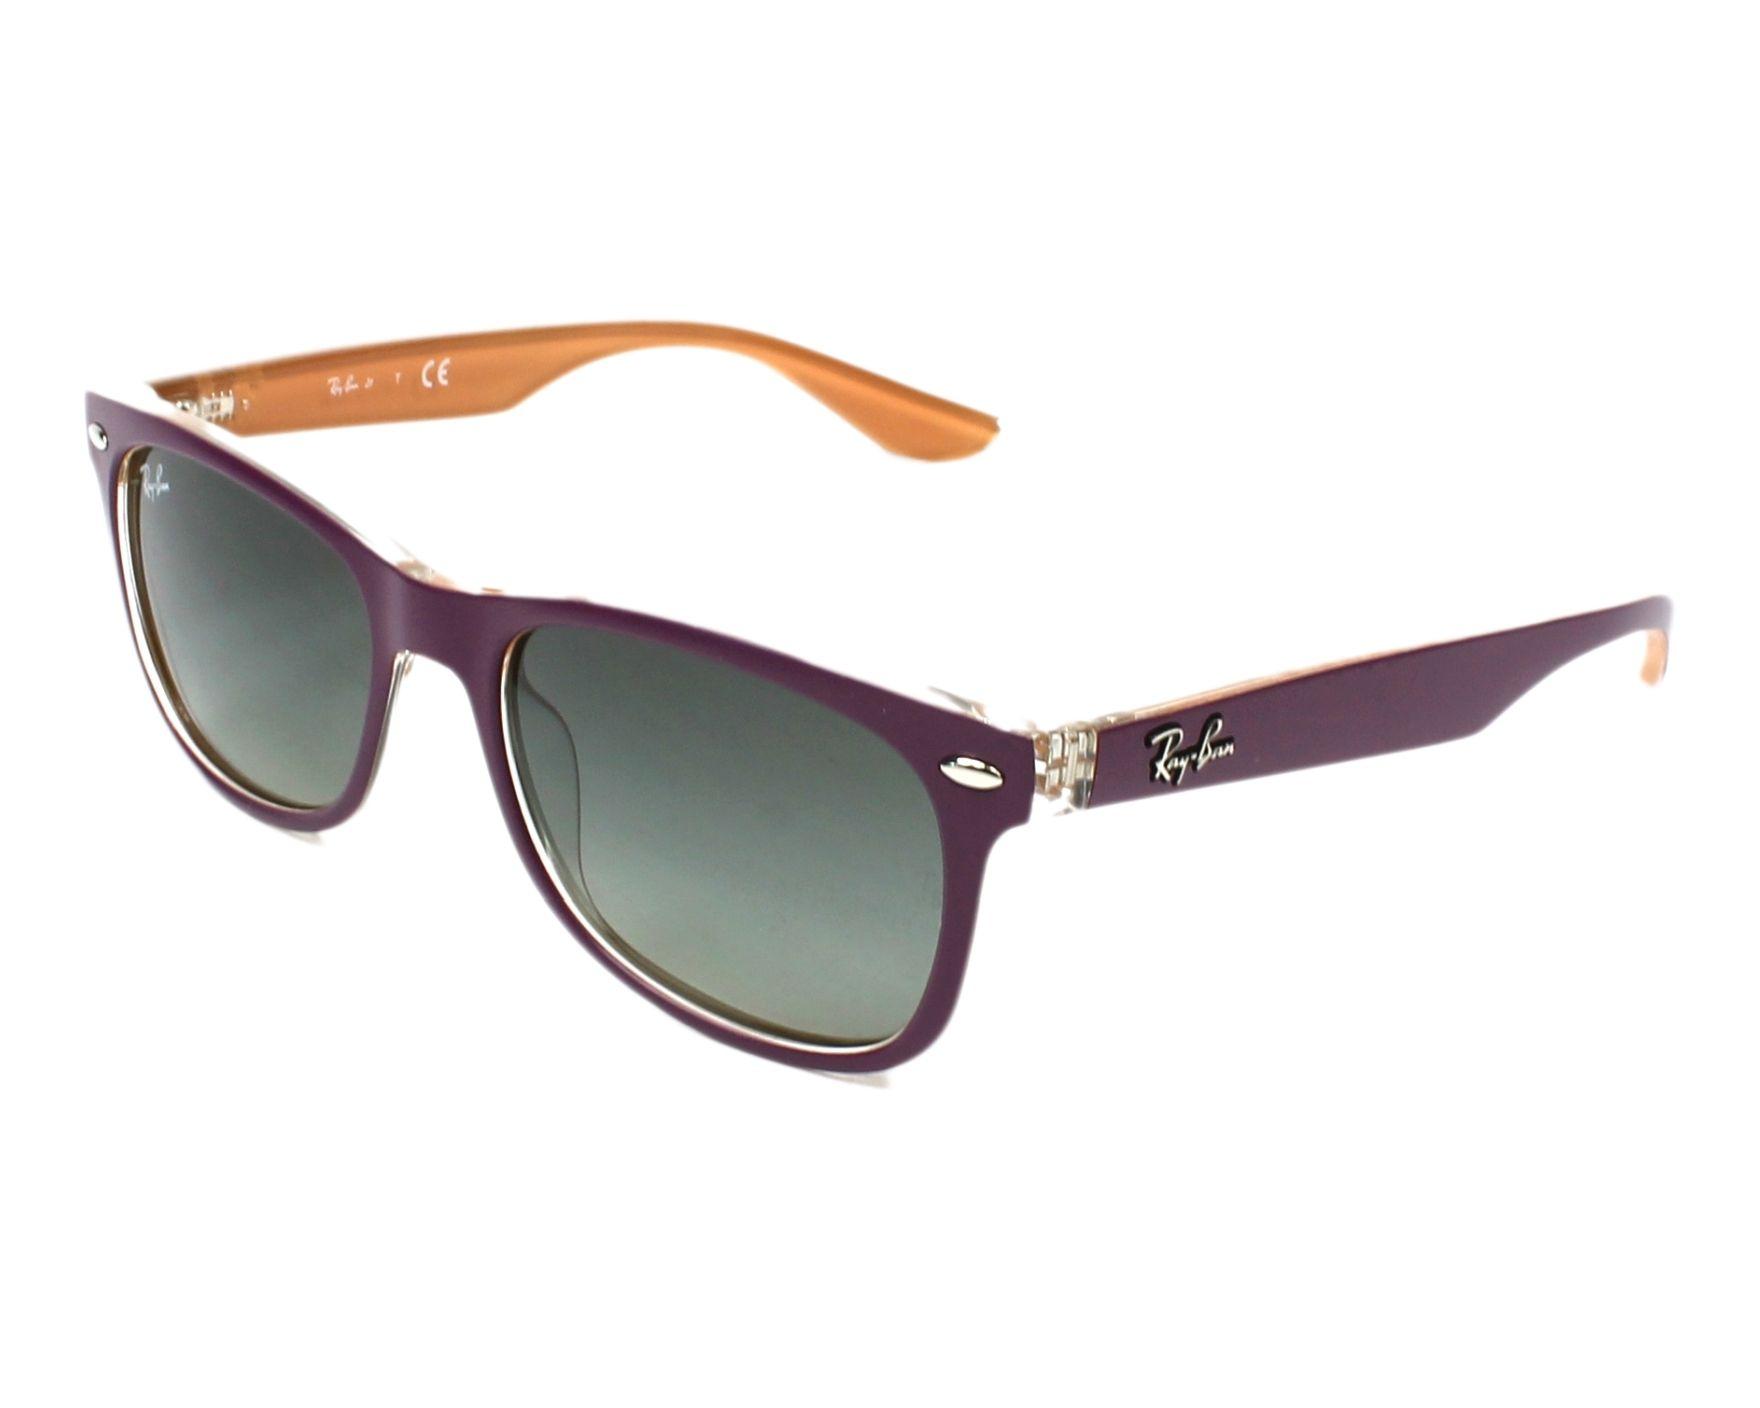 092621d8b46 Sunglasses RAY-BAN JUNIOR RJ 9052S 702211 48 16 Child noir Wayfarer .